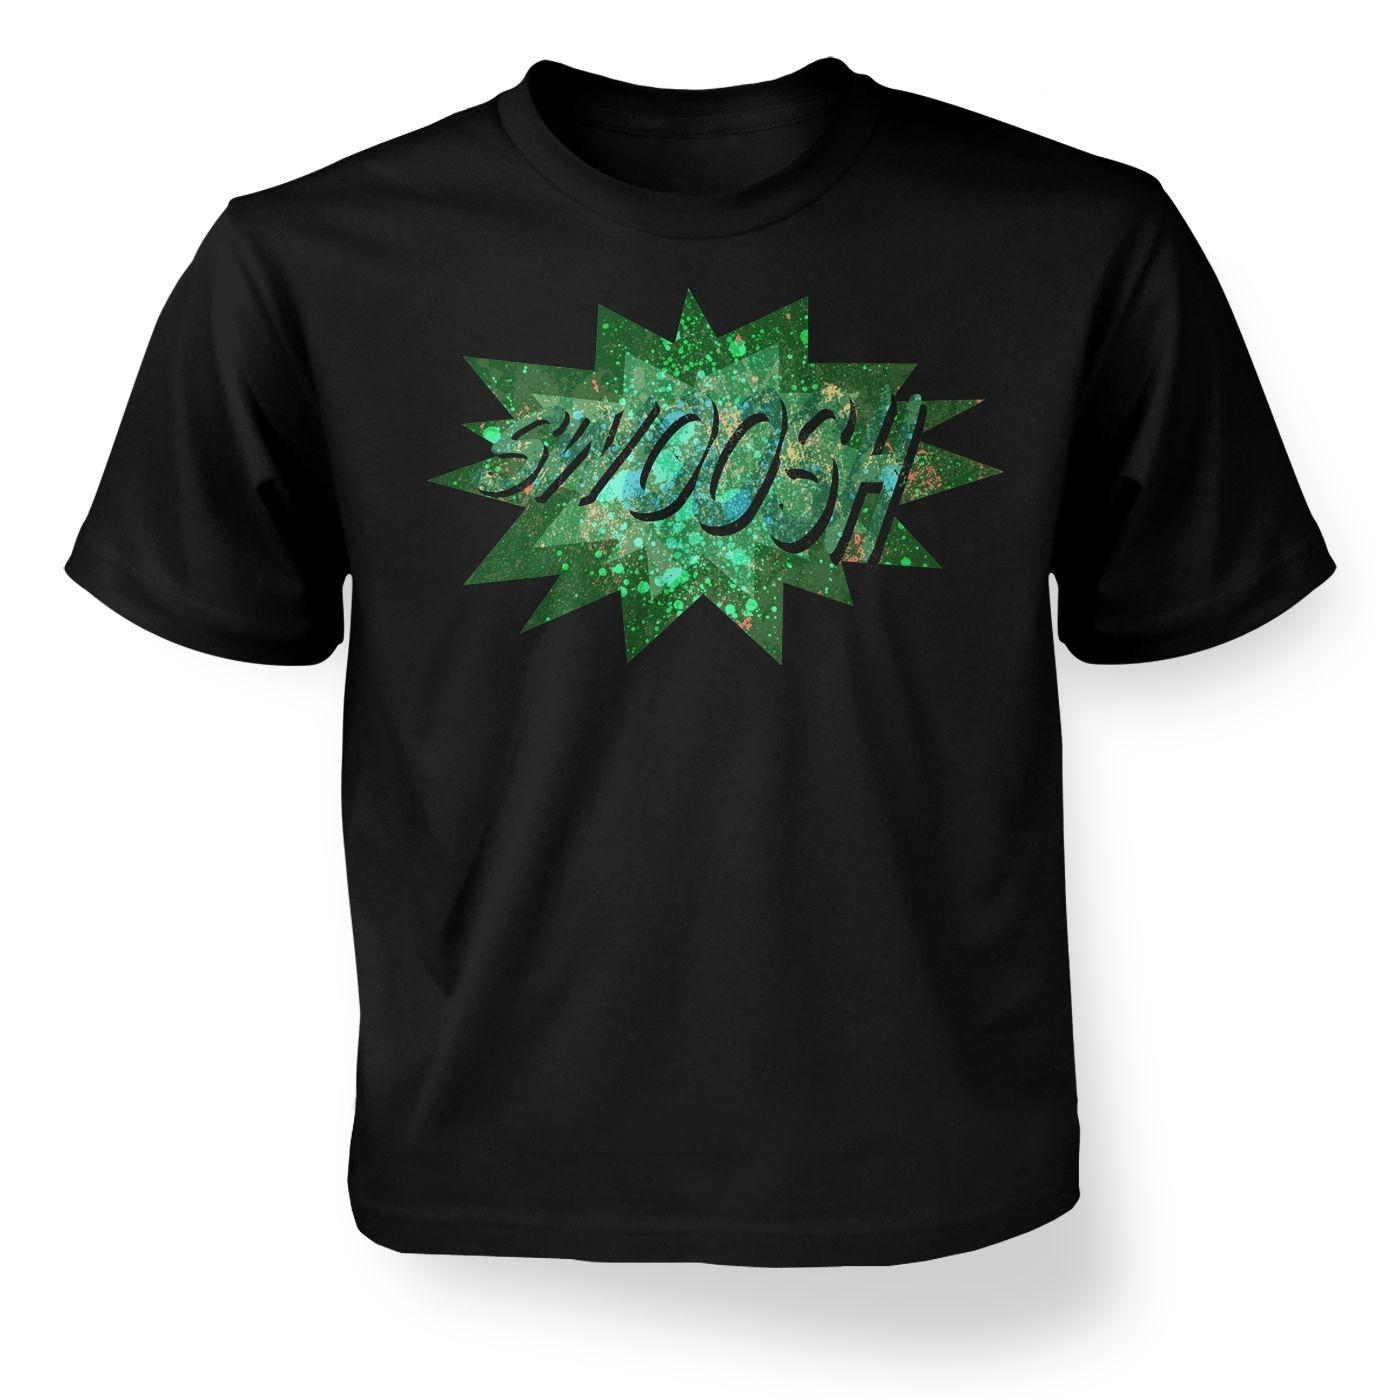 Swoosh kid's t-shirt